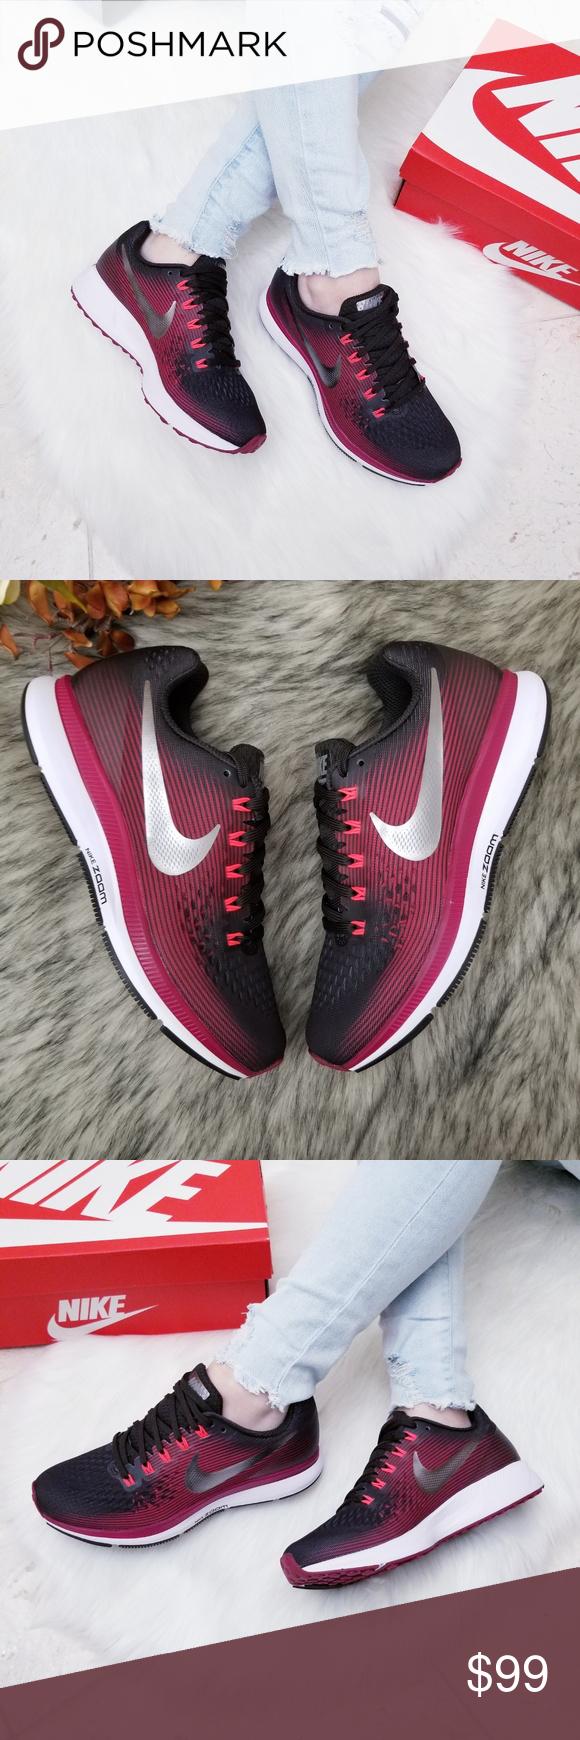 size 40 e37e4 28ea4 Nike Air Zoom Pegasus 34 Gem New In Box, No Box Lid, 100 ...